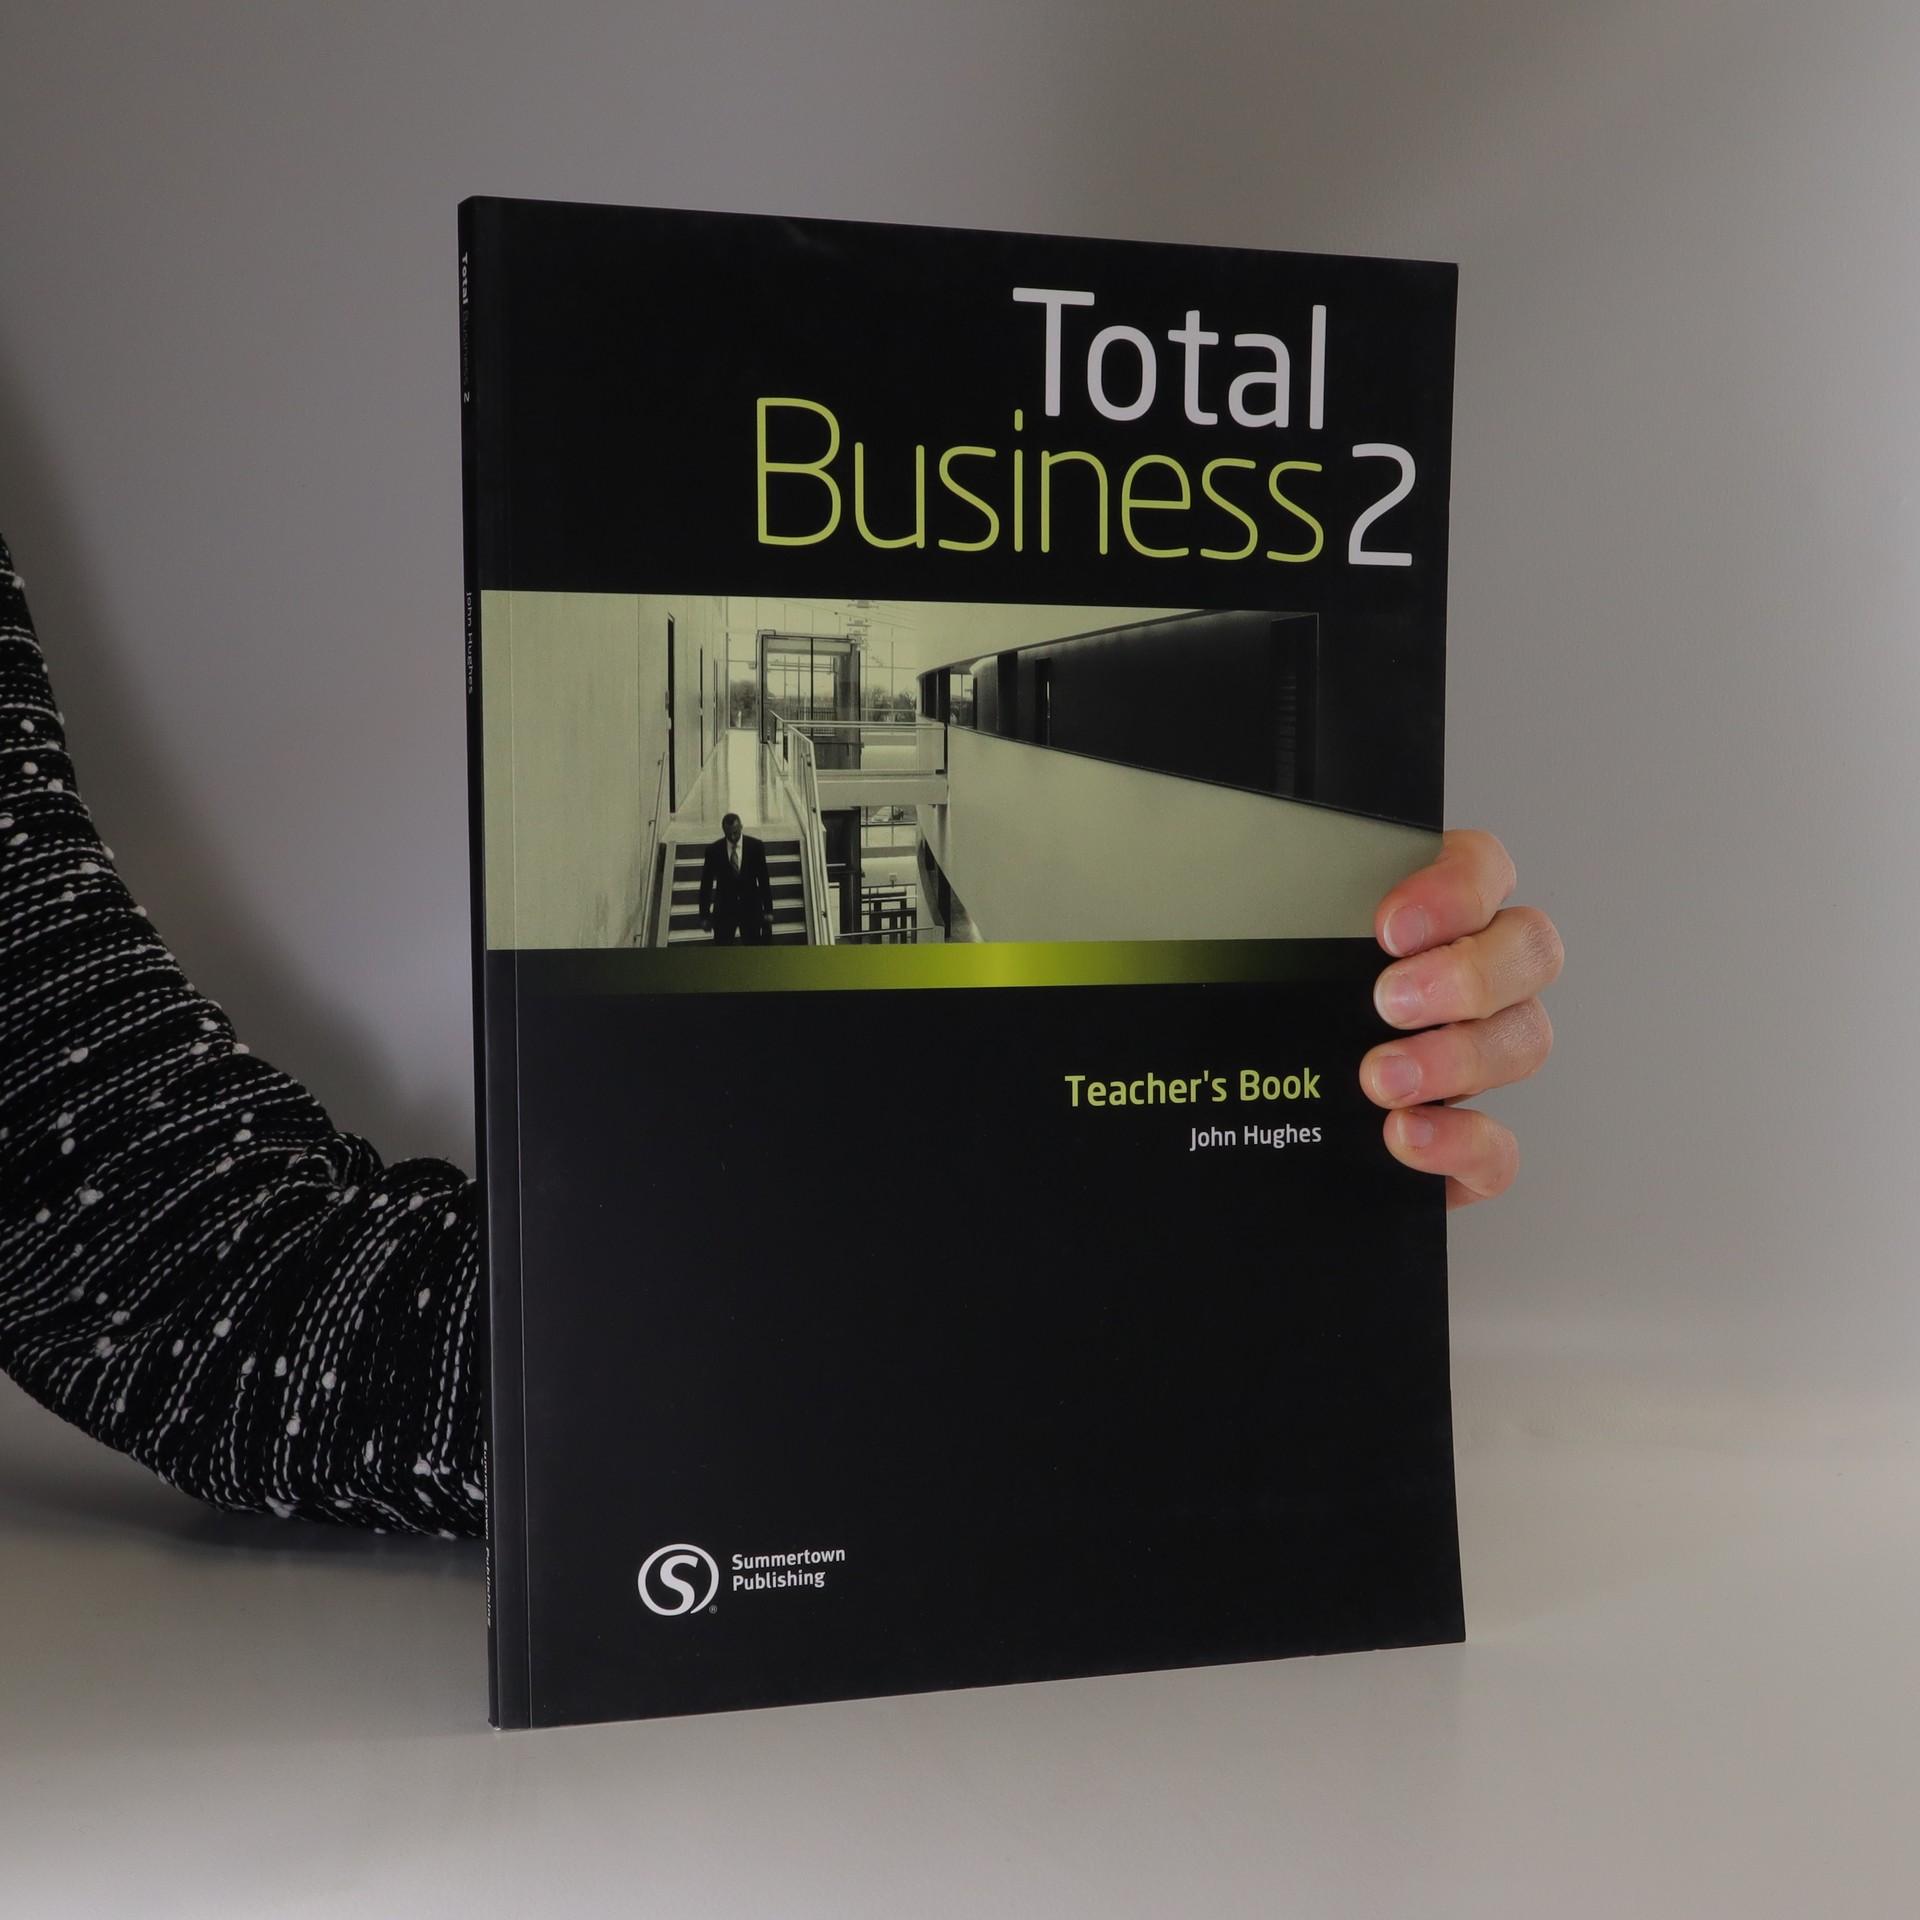 antikvární kniha Total business 2. Teacher's book, 2009